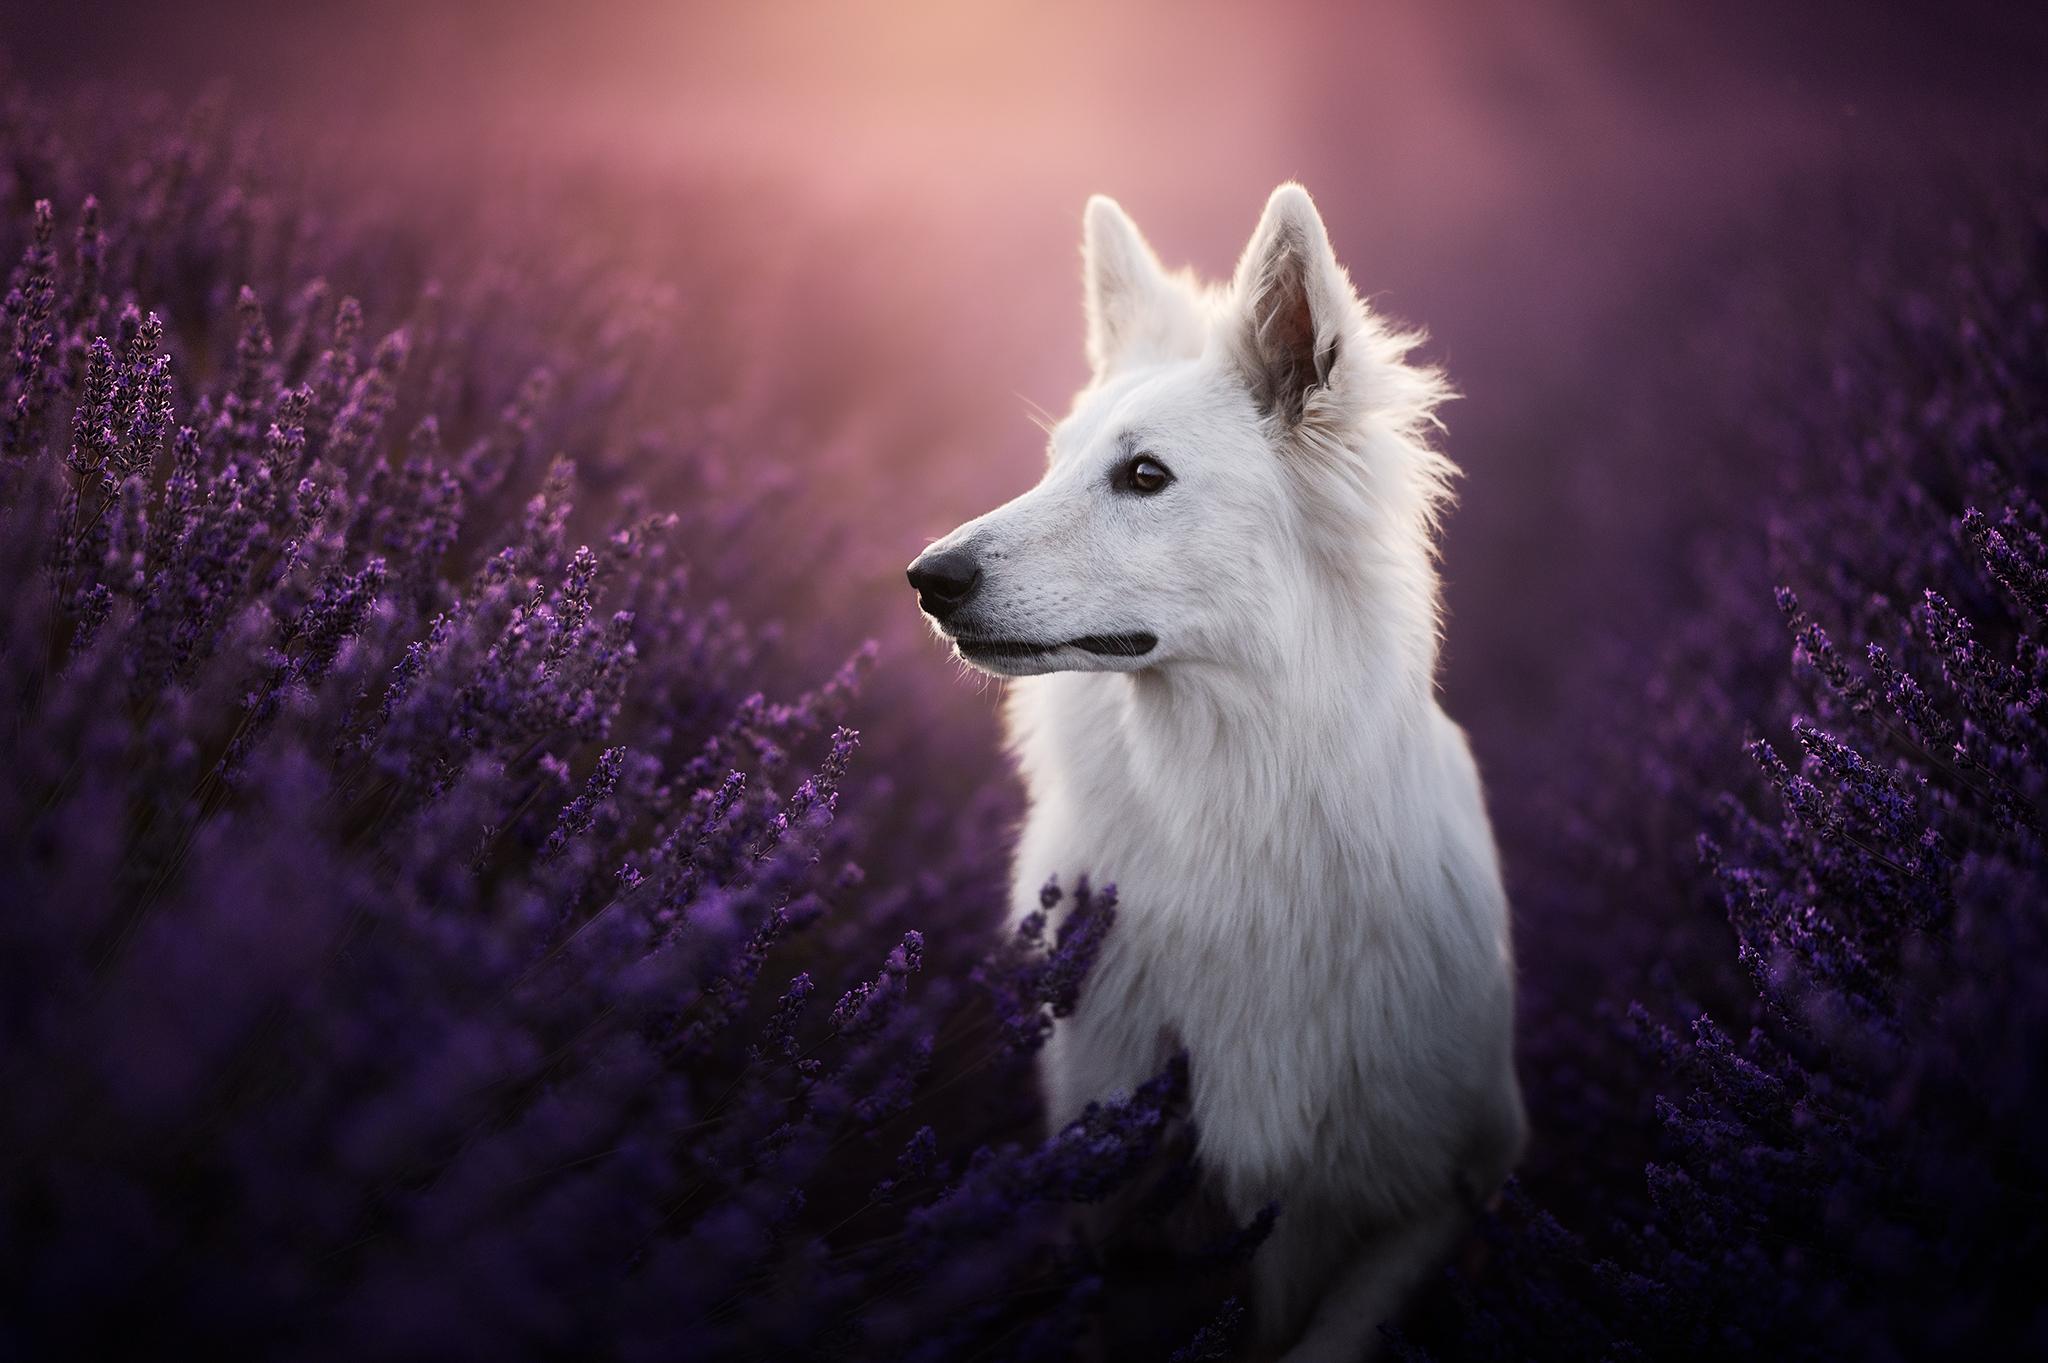 Séance photo Chien Photographe Canin France